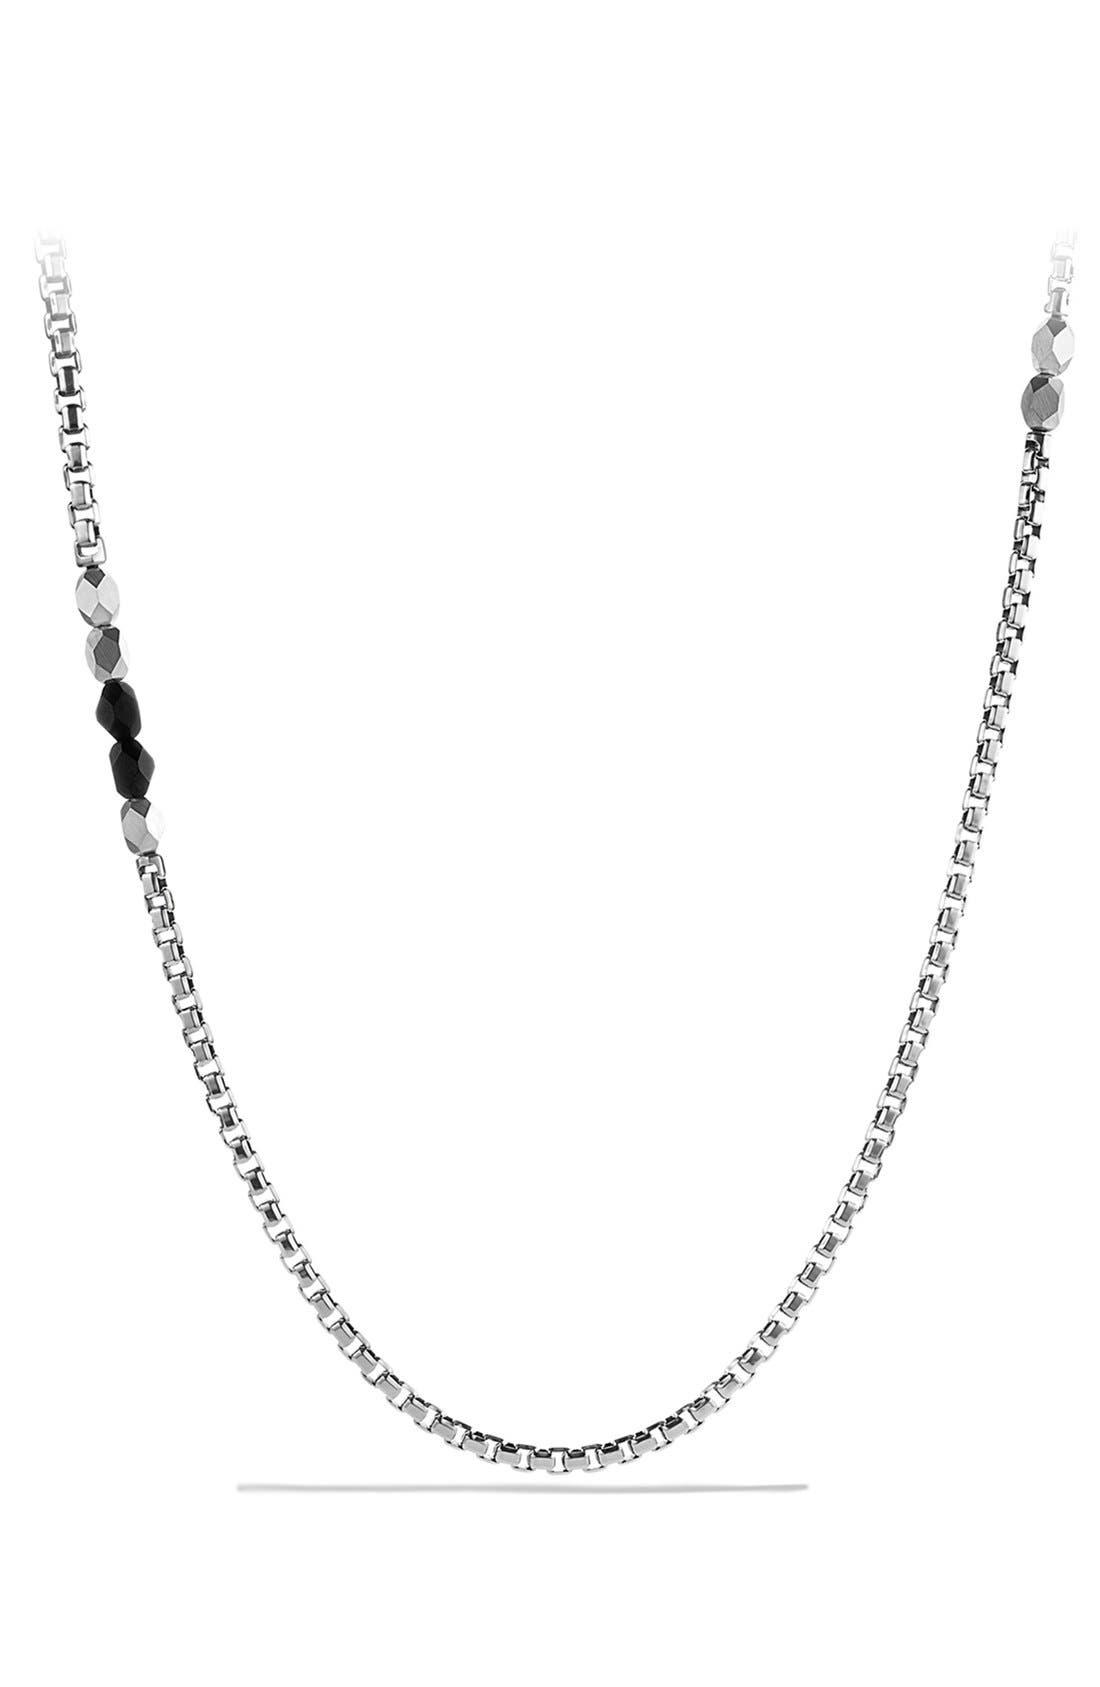 David Yurman 'Faceted' Metal Necklace